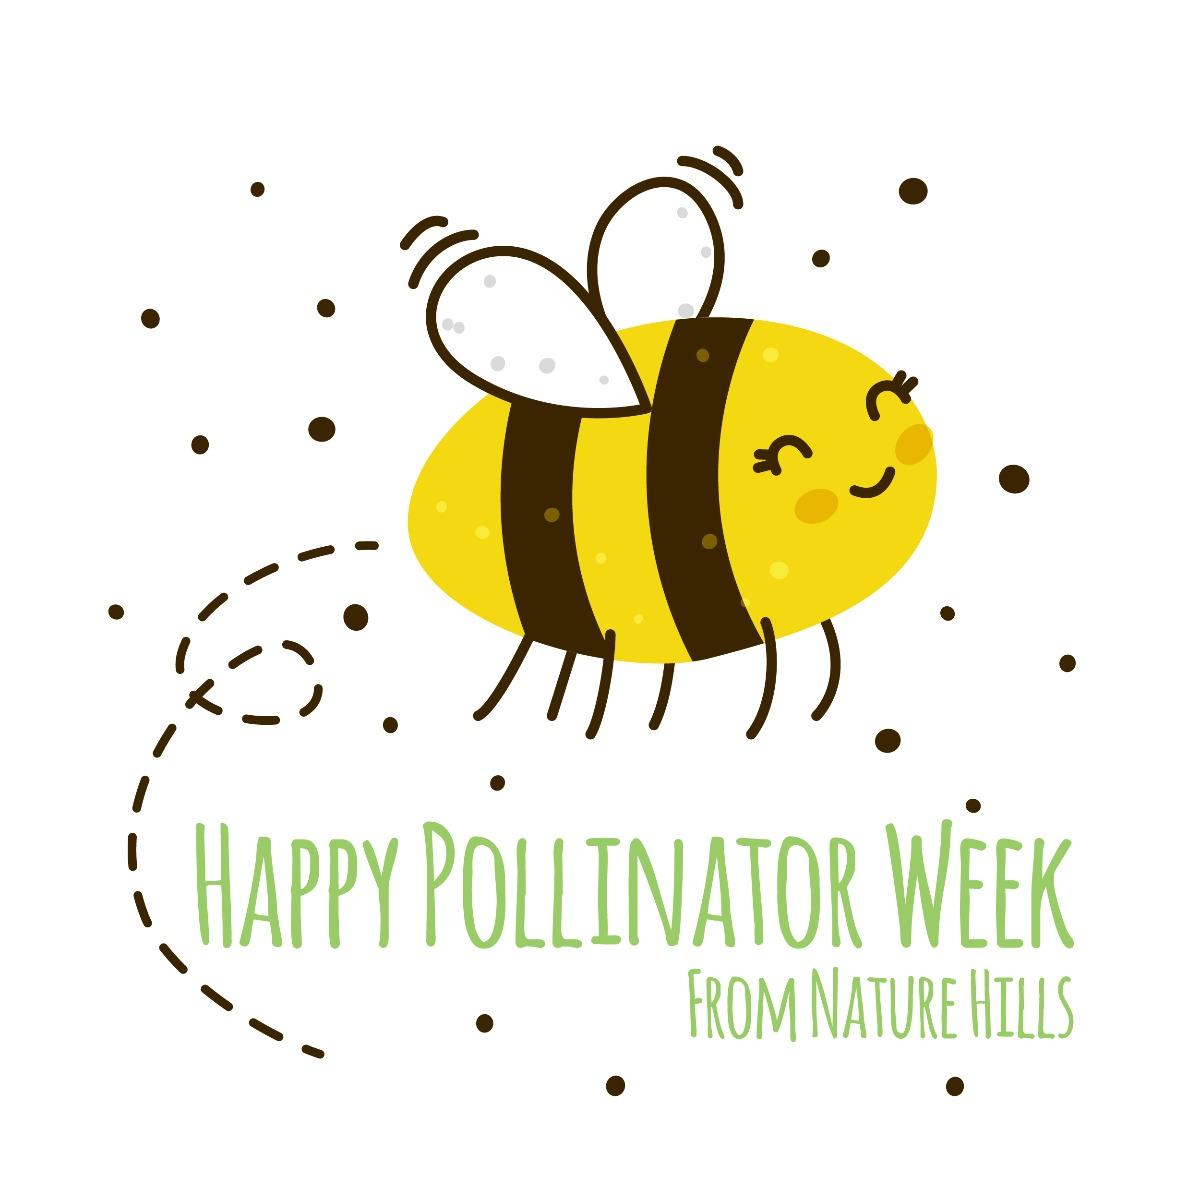 Happy Pollinator Week